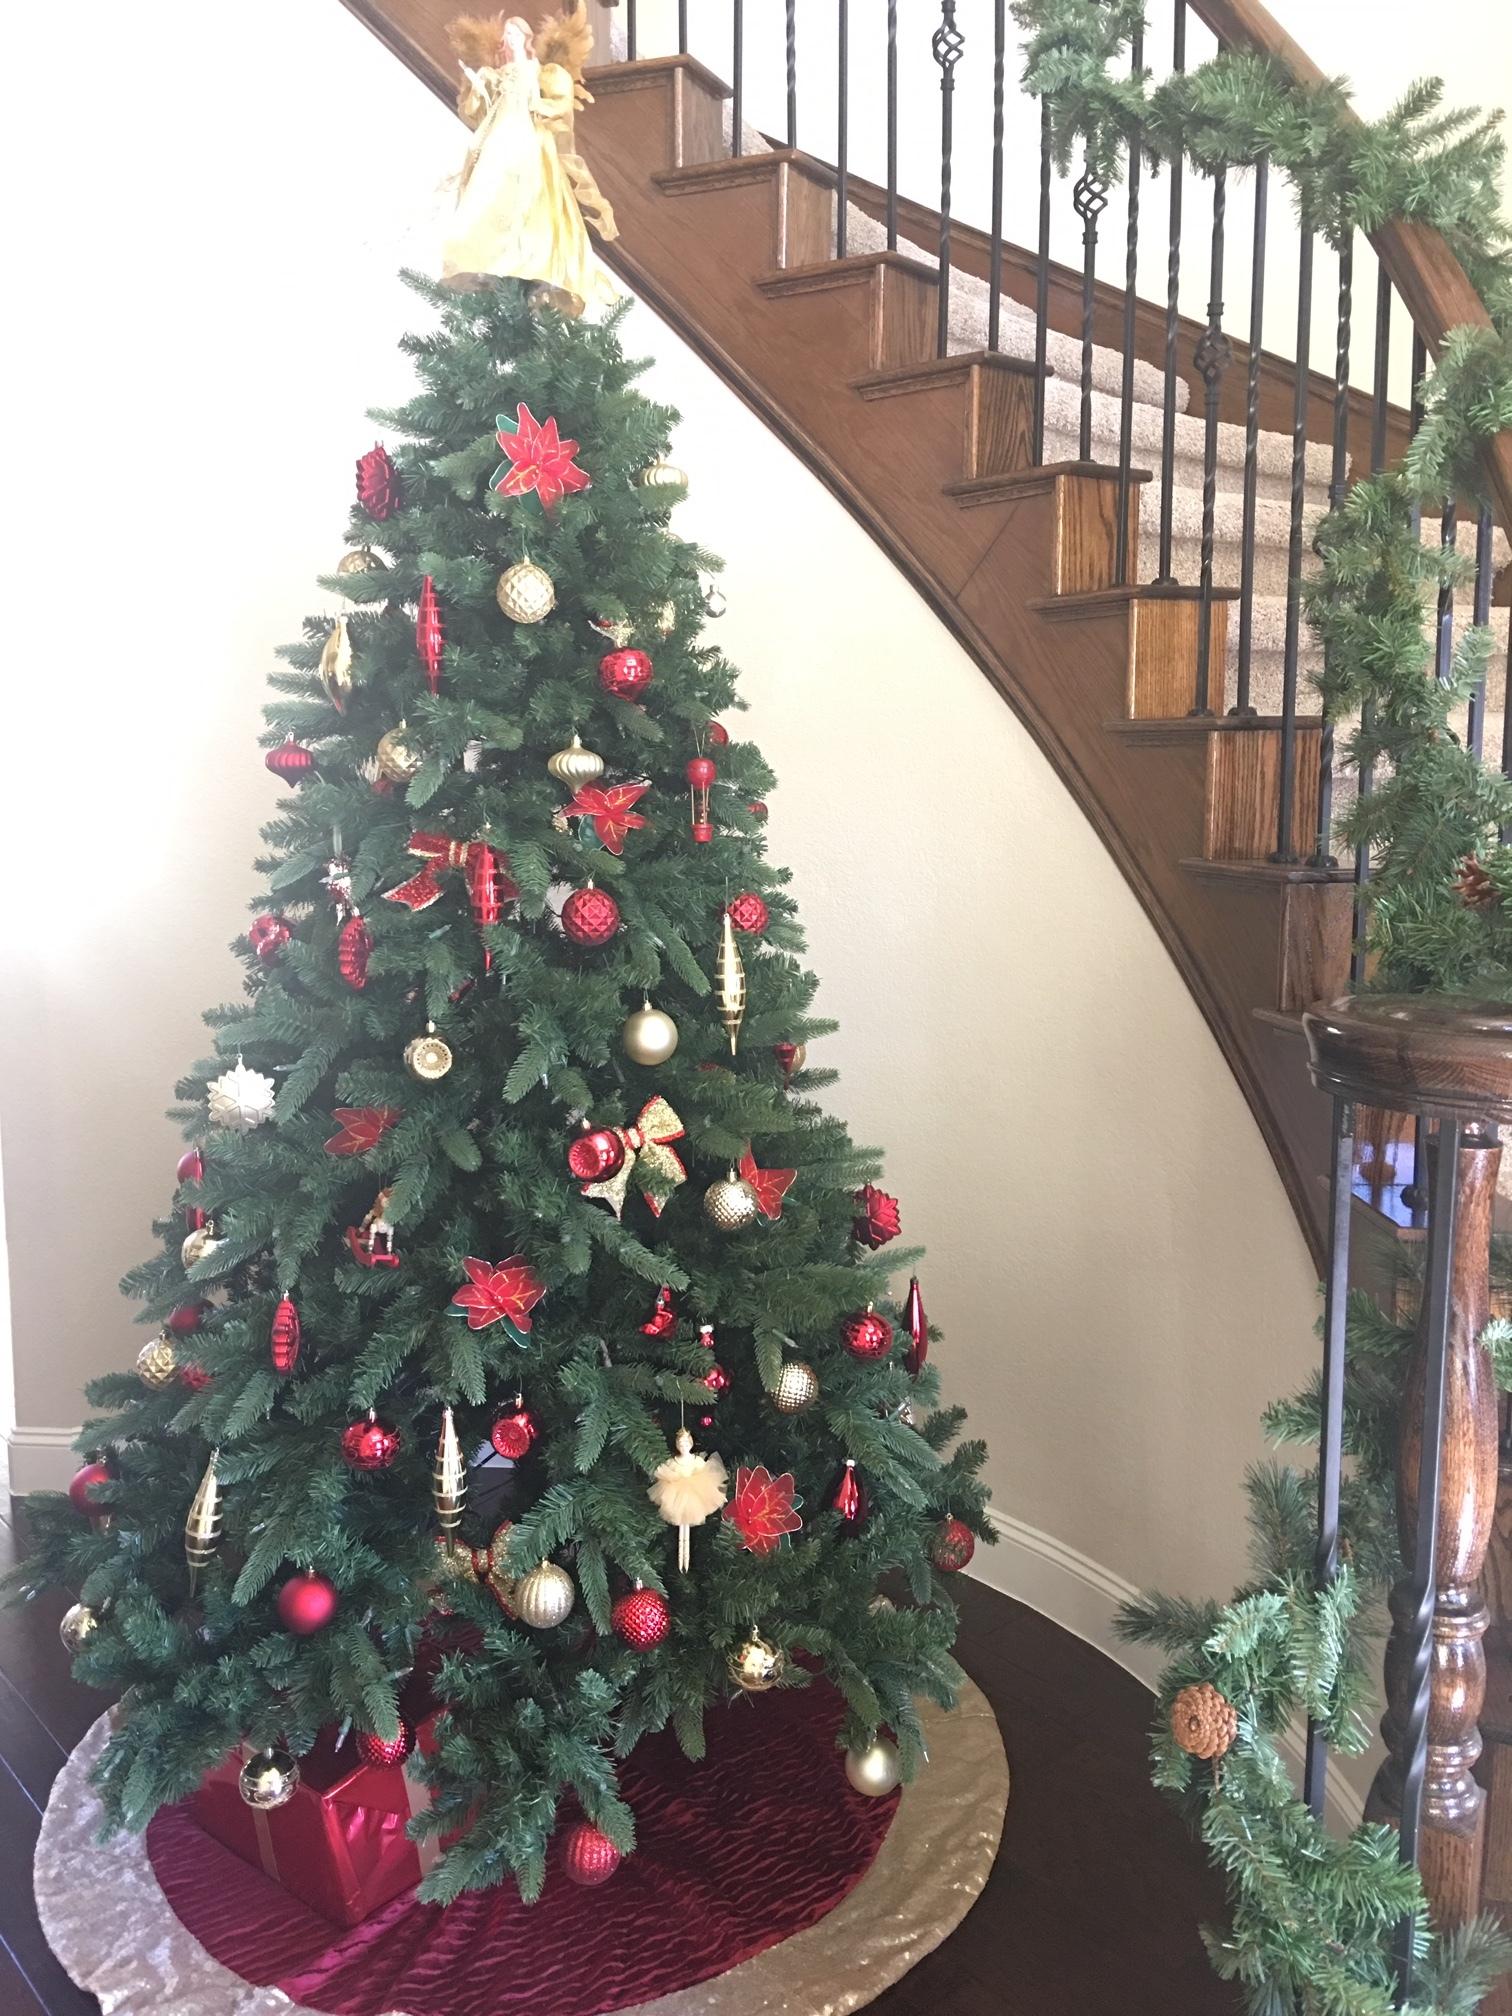 - 7.5' Sierra Nevada Christmas tree